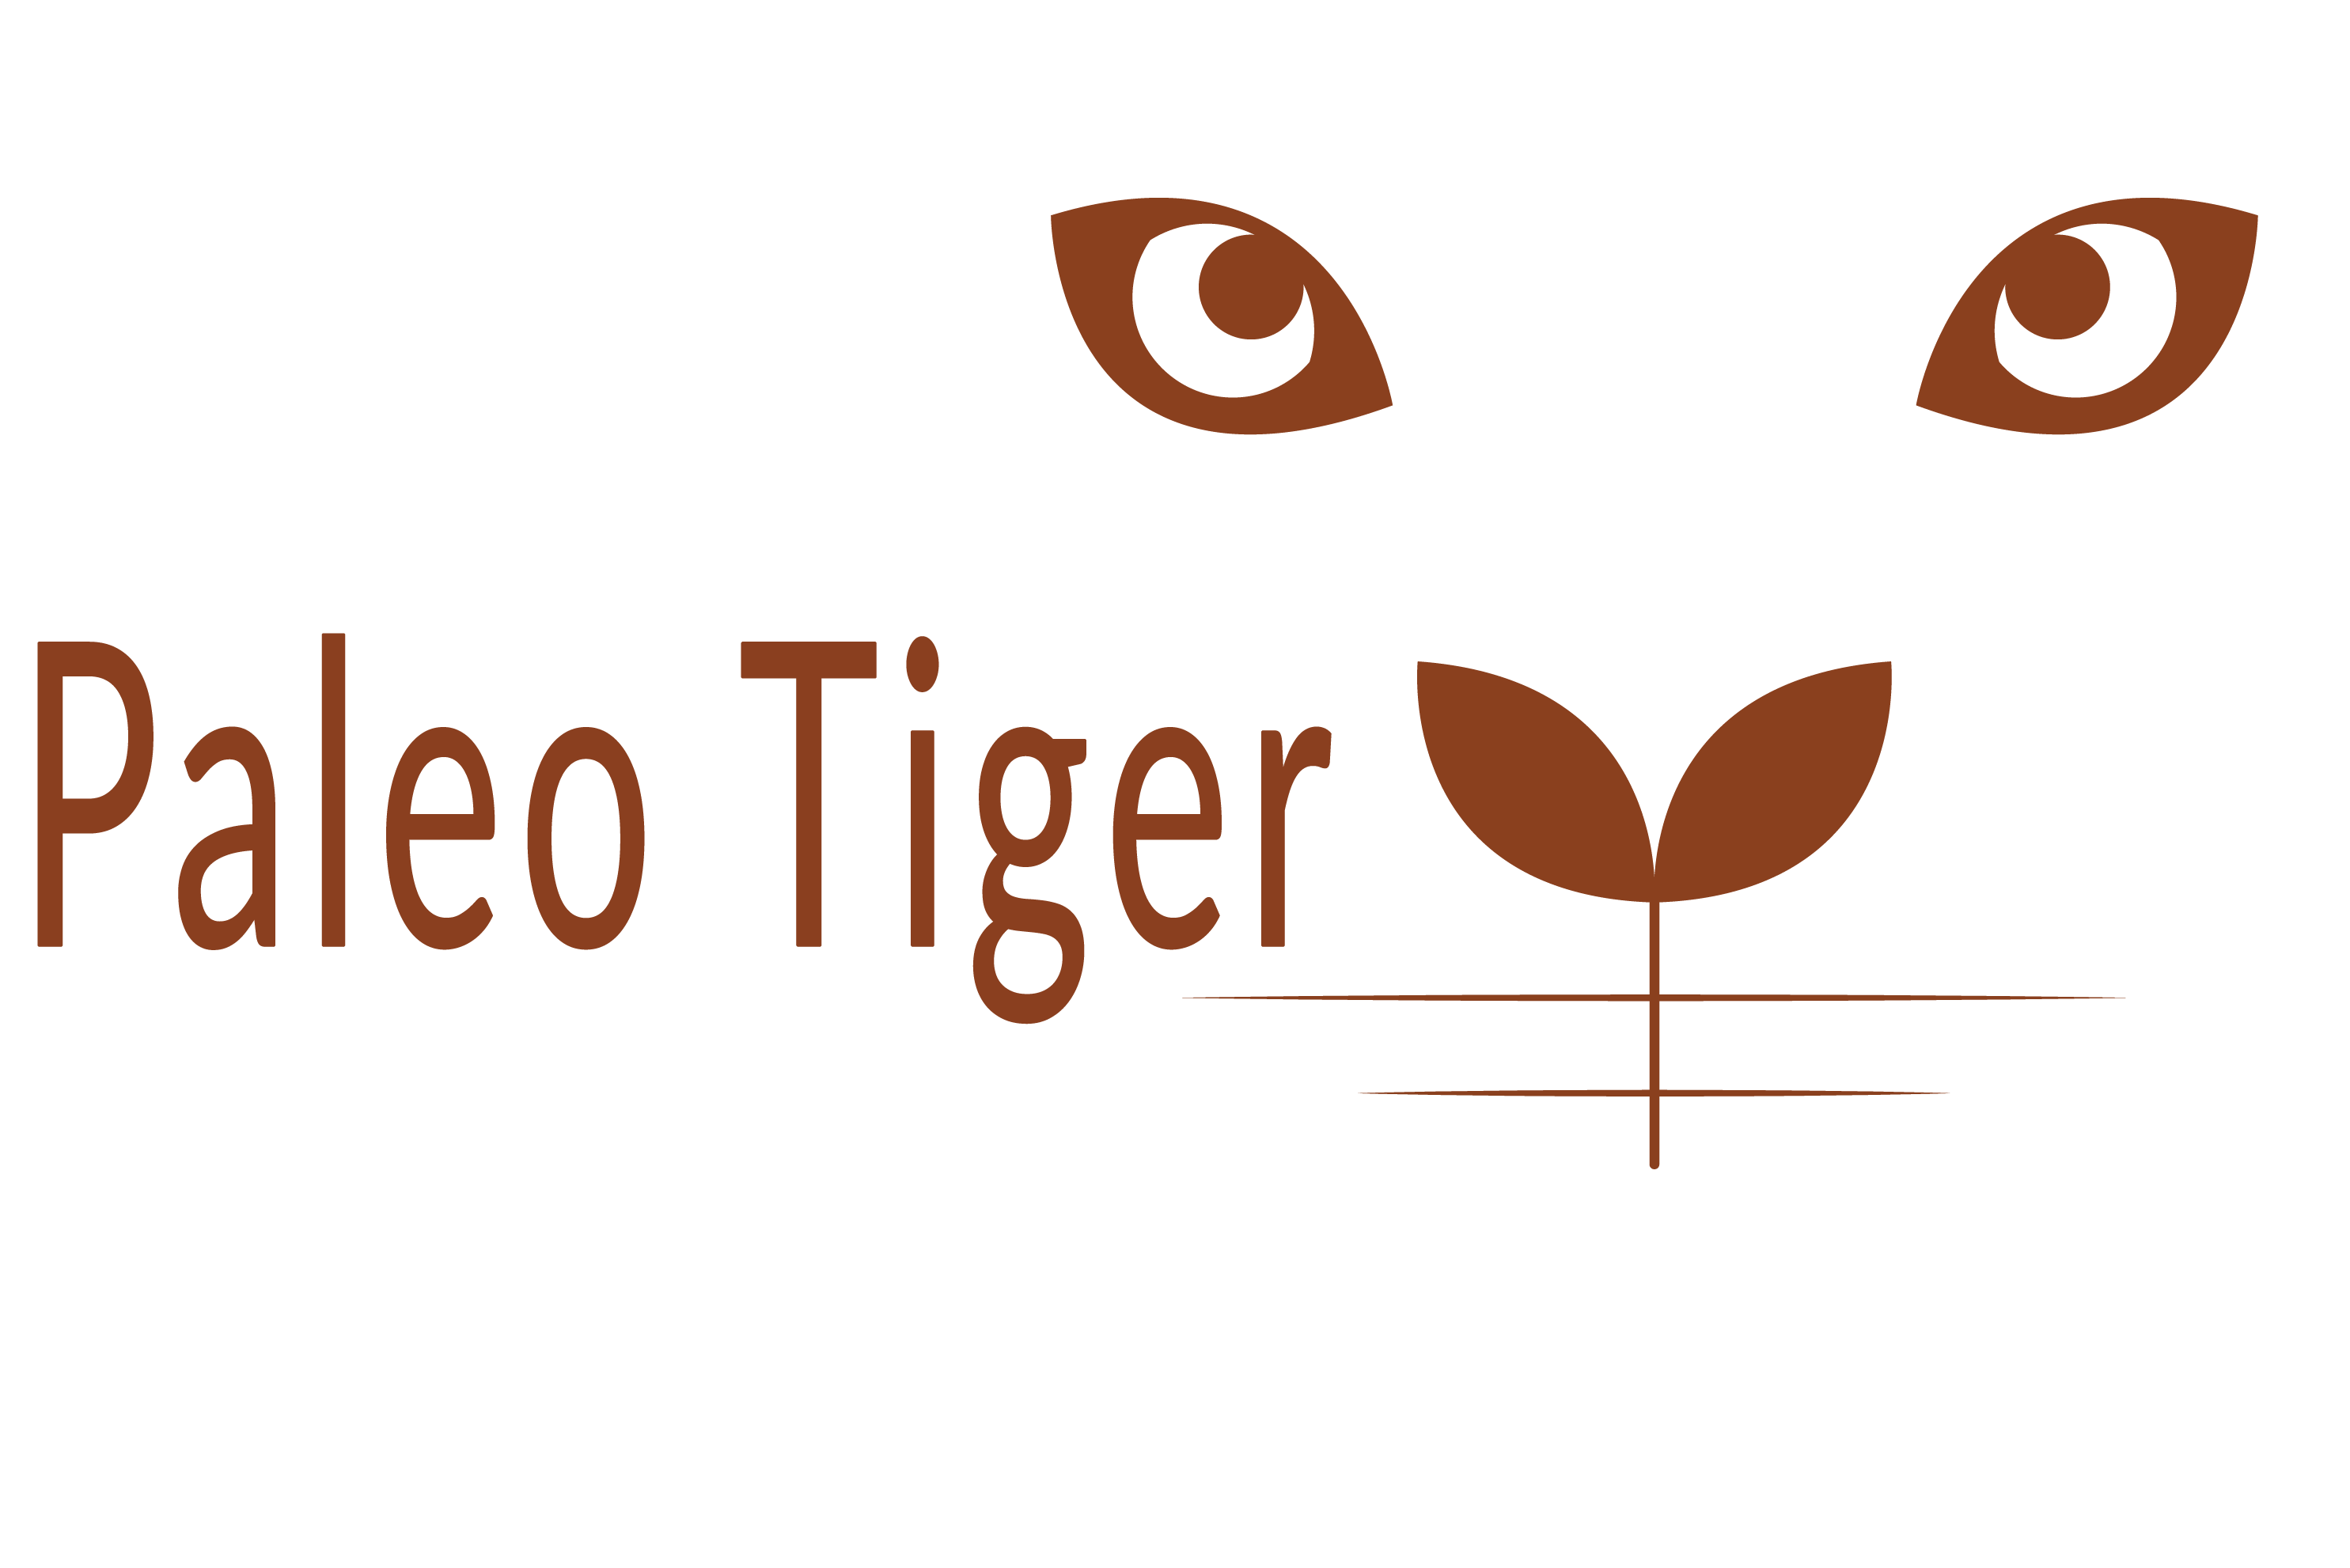 Paleo Tiger